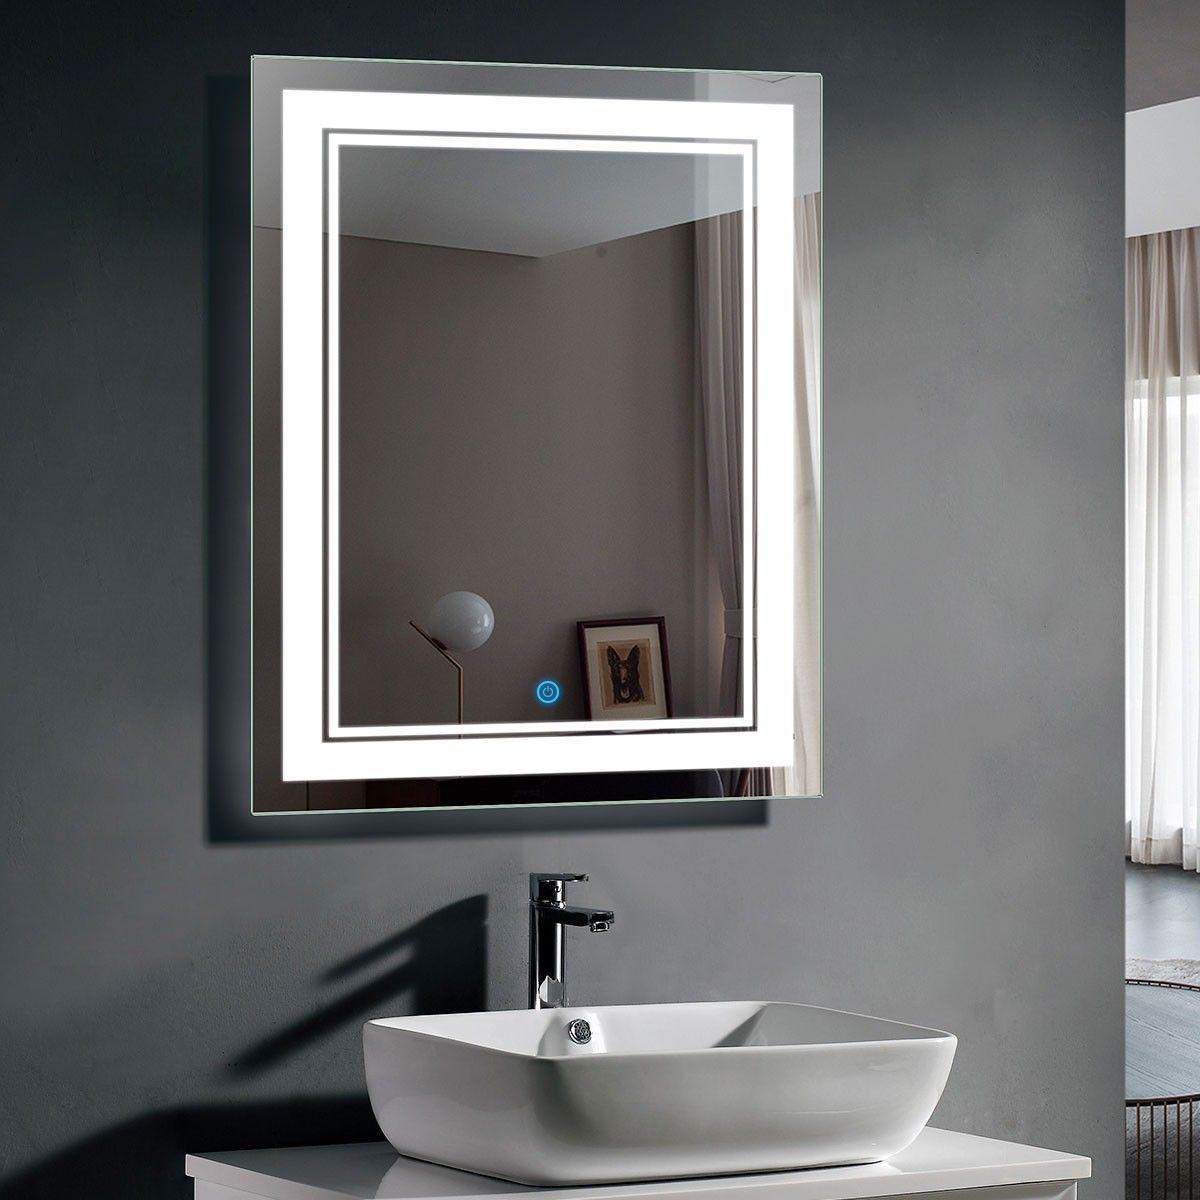 Lovely Lighted Bathroom Wall Mirror Mirror Wall Bathroom Led Mirror Led Mirror Bathroom